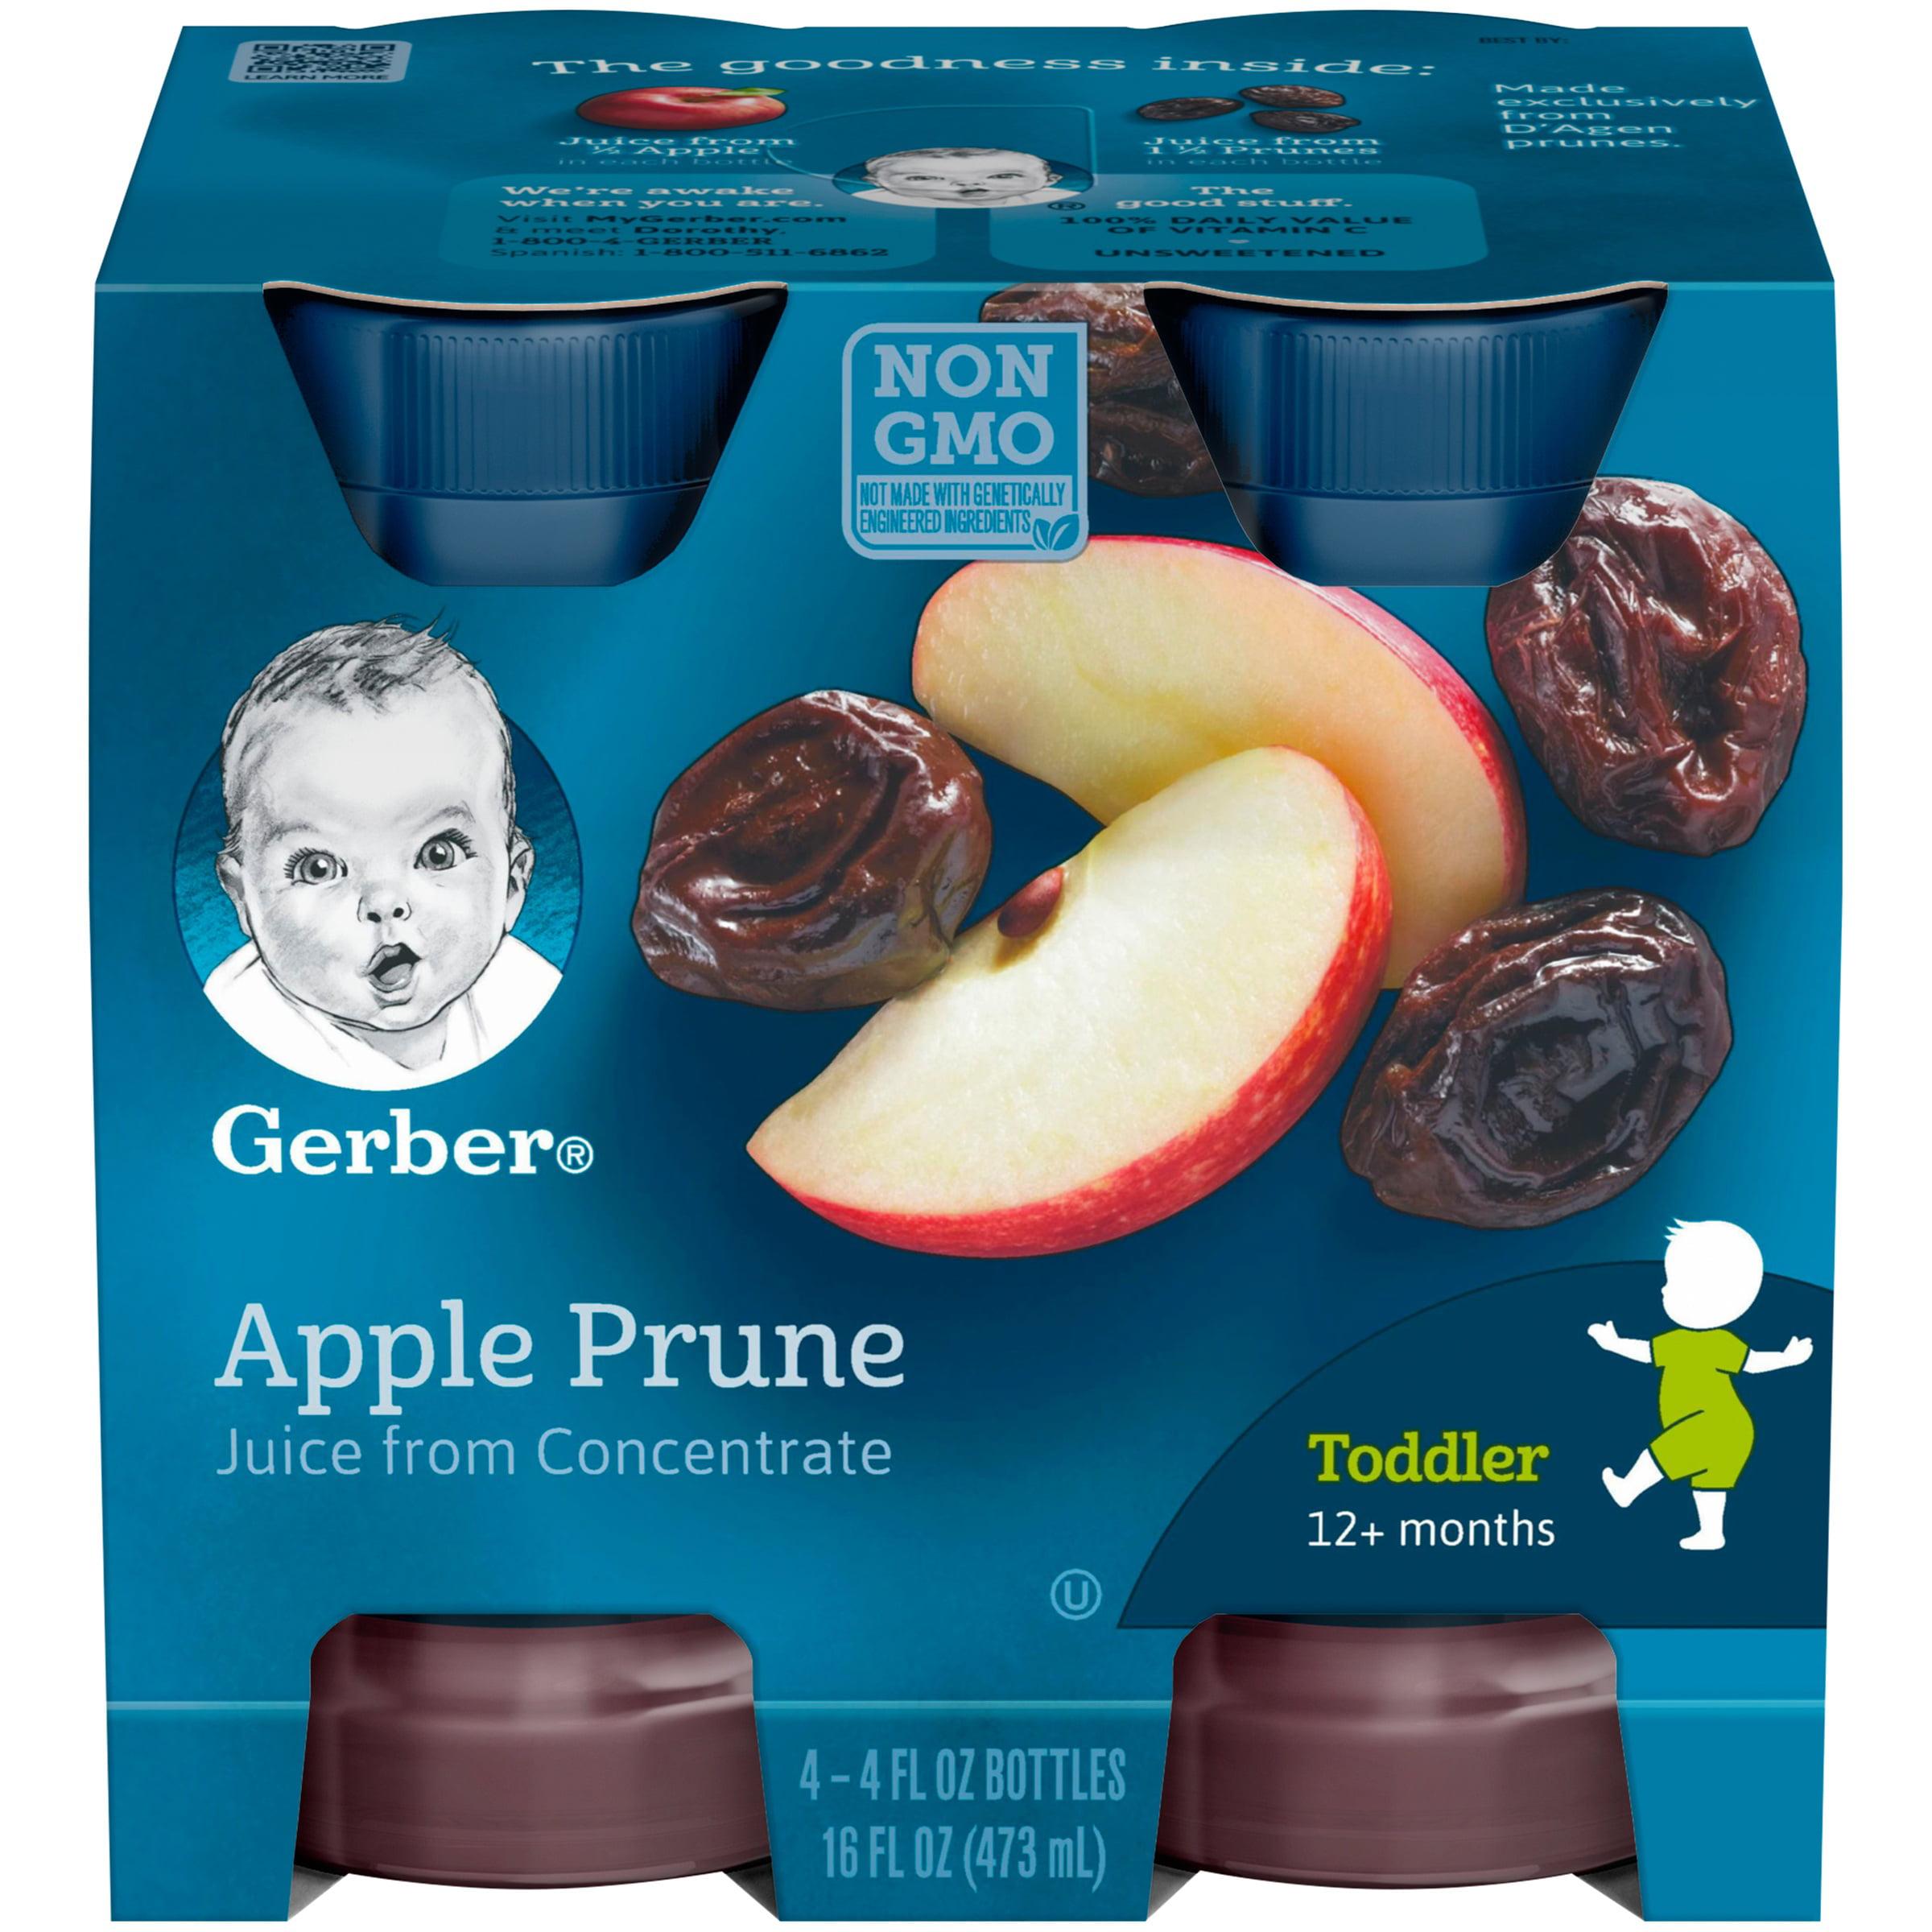 GERBER Apple Prune Juice 4-4 fl. oz. Bottles